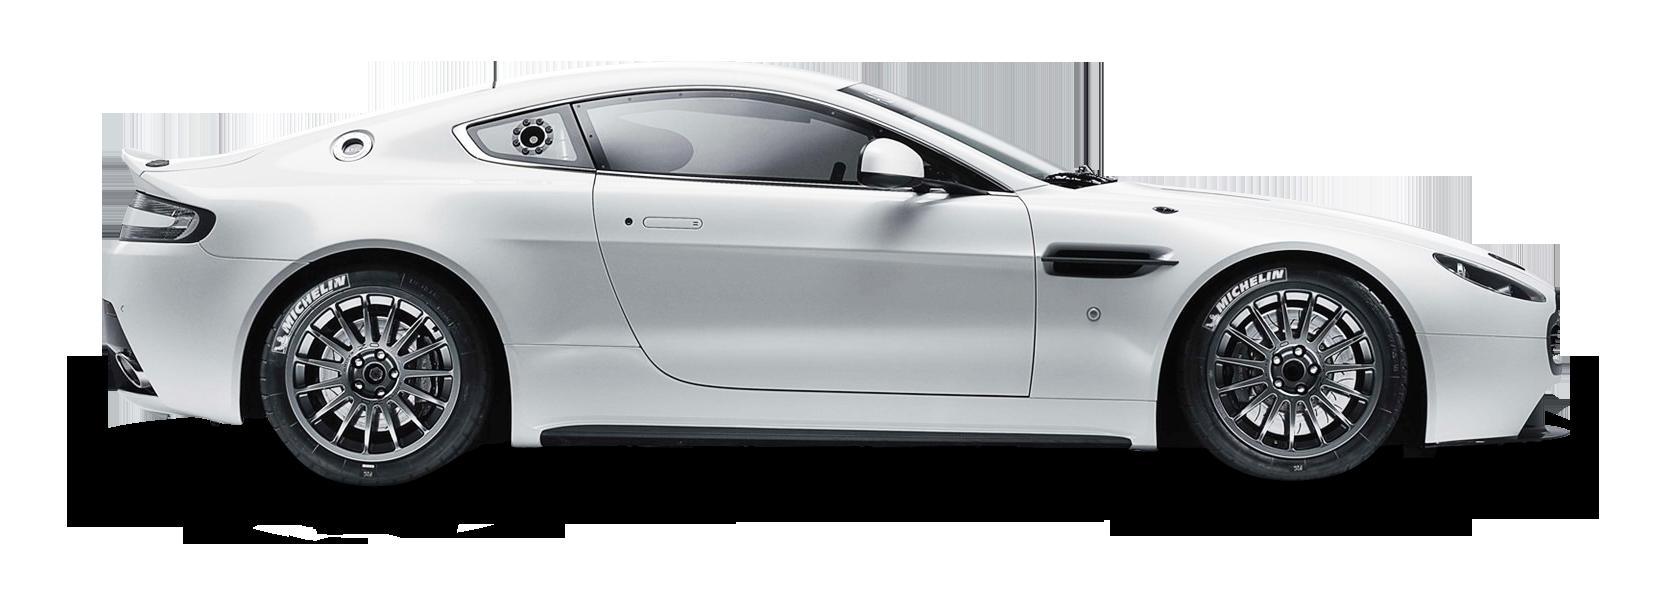 Aston Martin Vantage GT4 White PNG Image